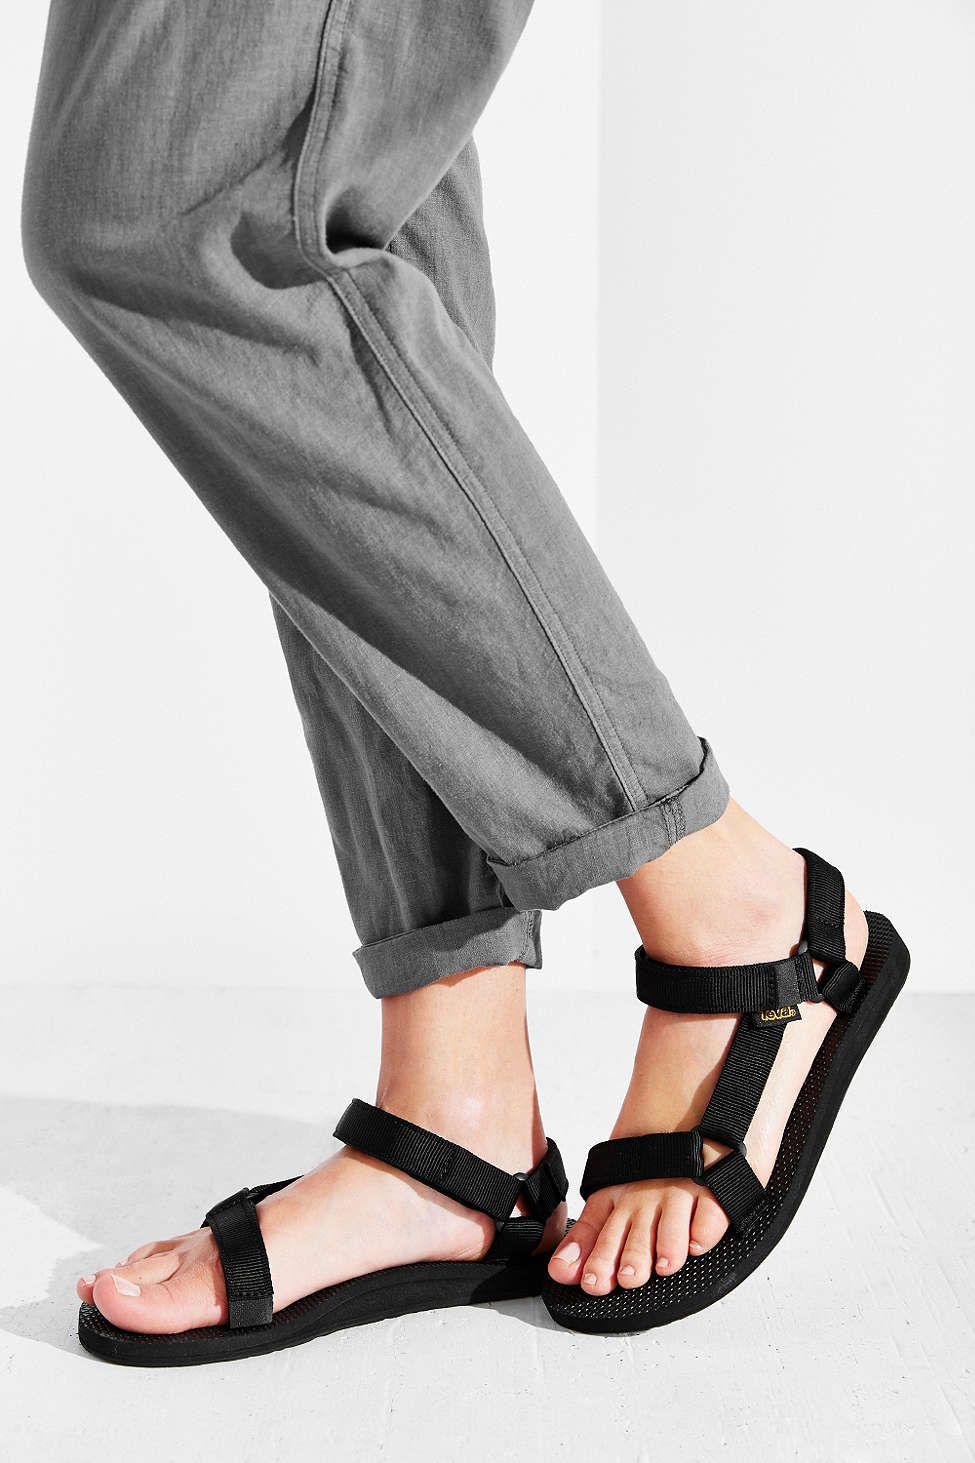 9a89eaeab45 Teva Original Universal Sandal - Urban Outfitters